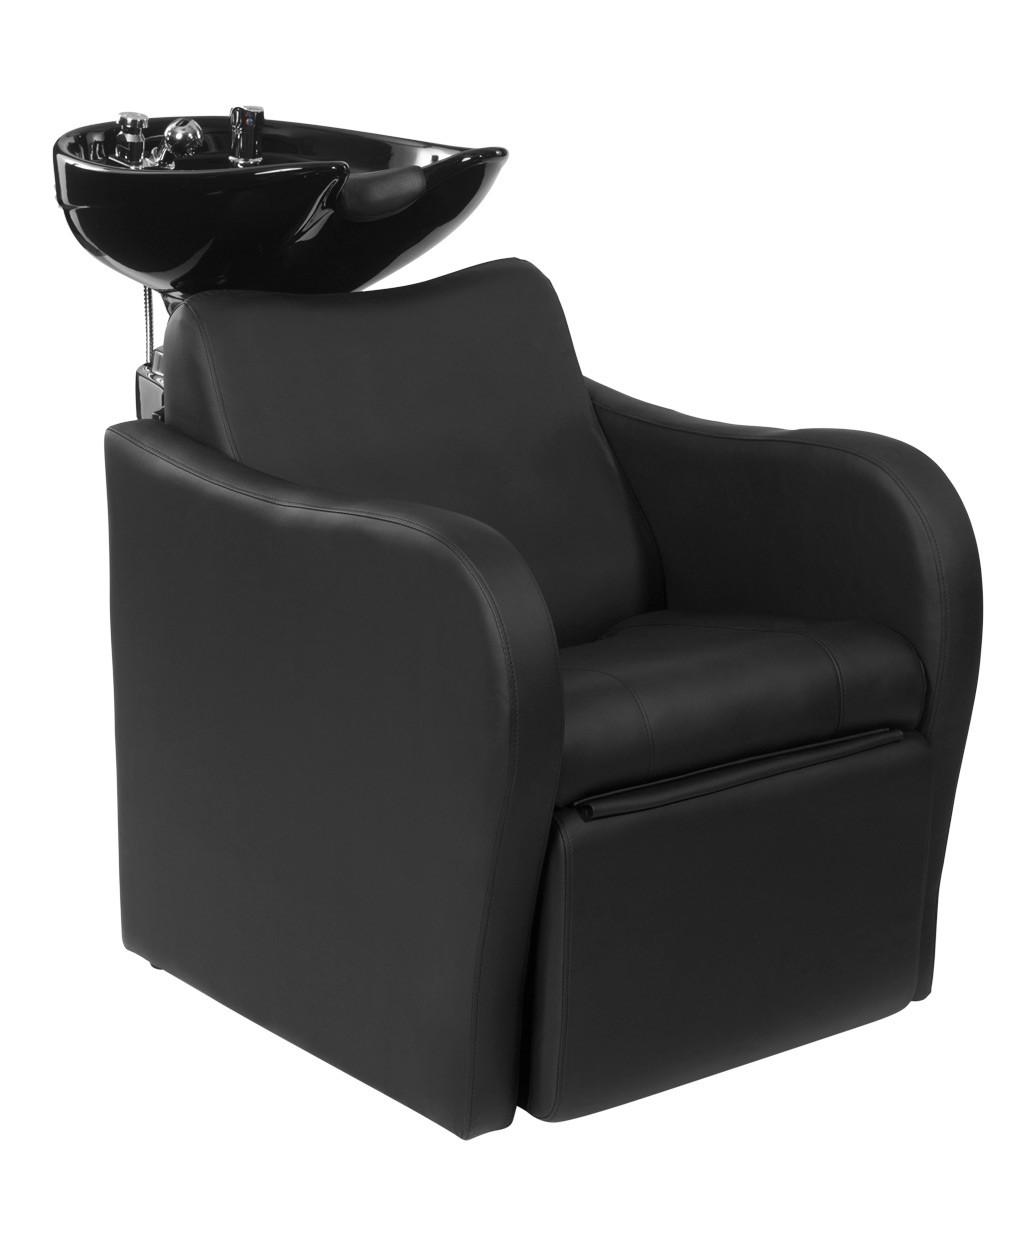 Atlsalonfurniture : atlsalonfurniture, Salon, Equipment:, Buy-Rite, Beauty, Supplies, Furniture